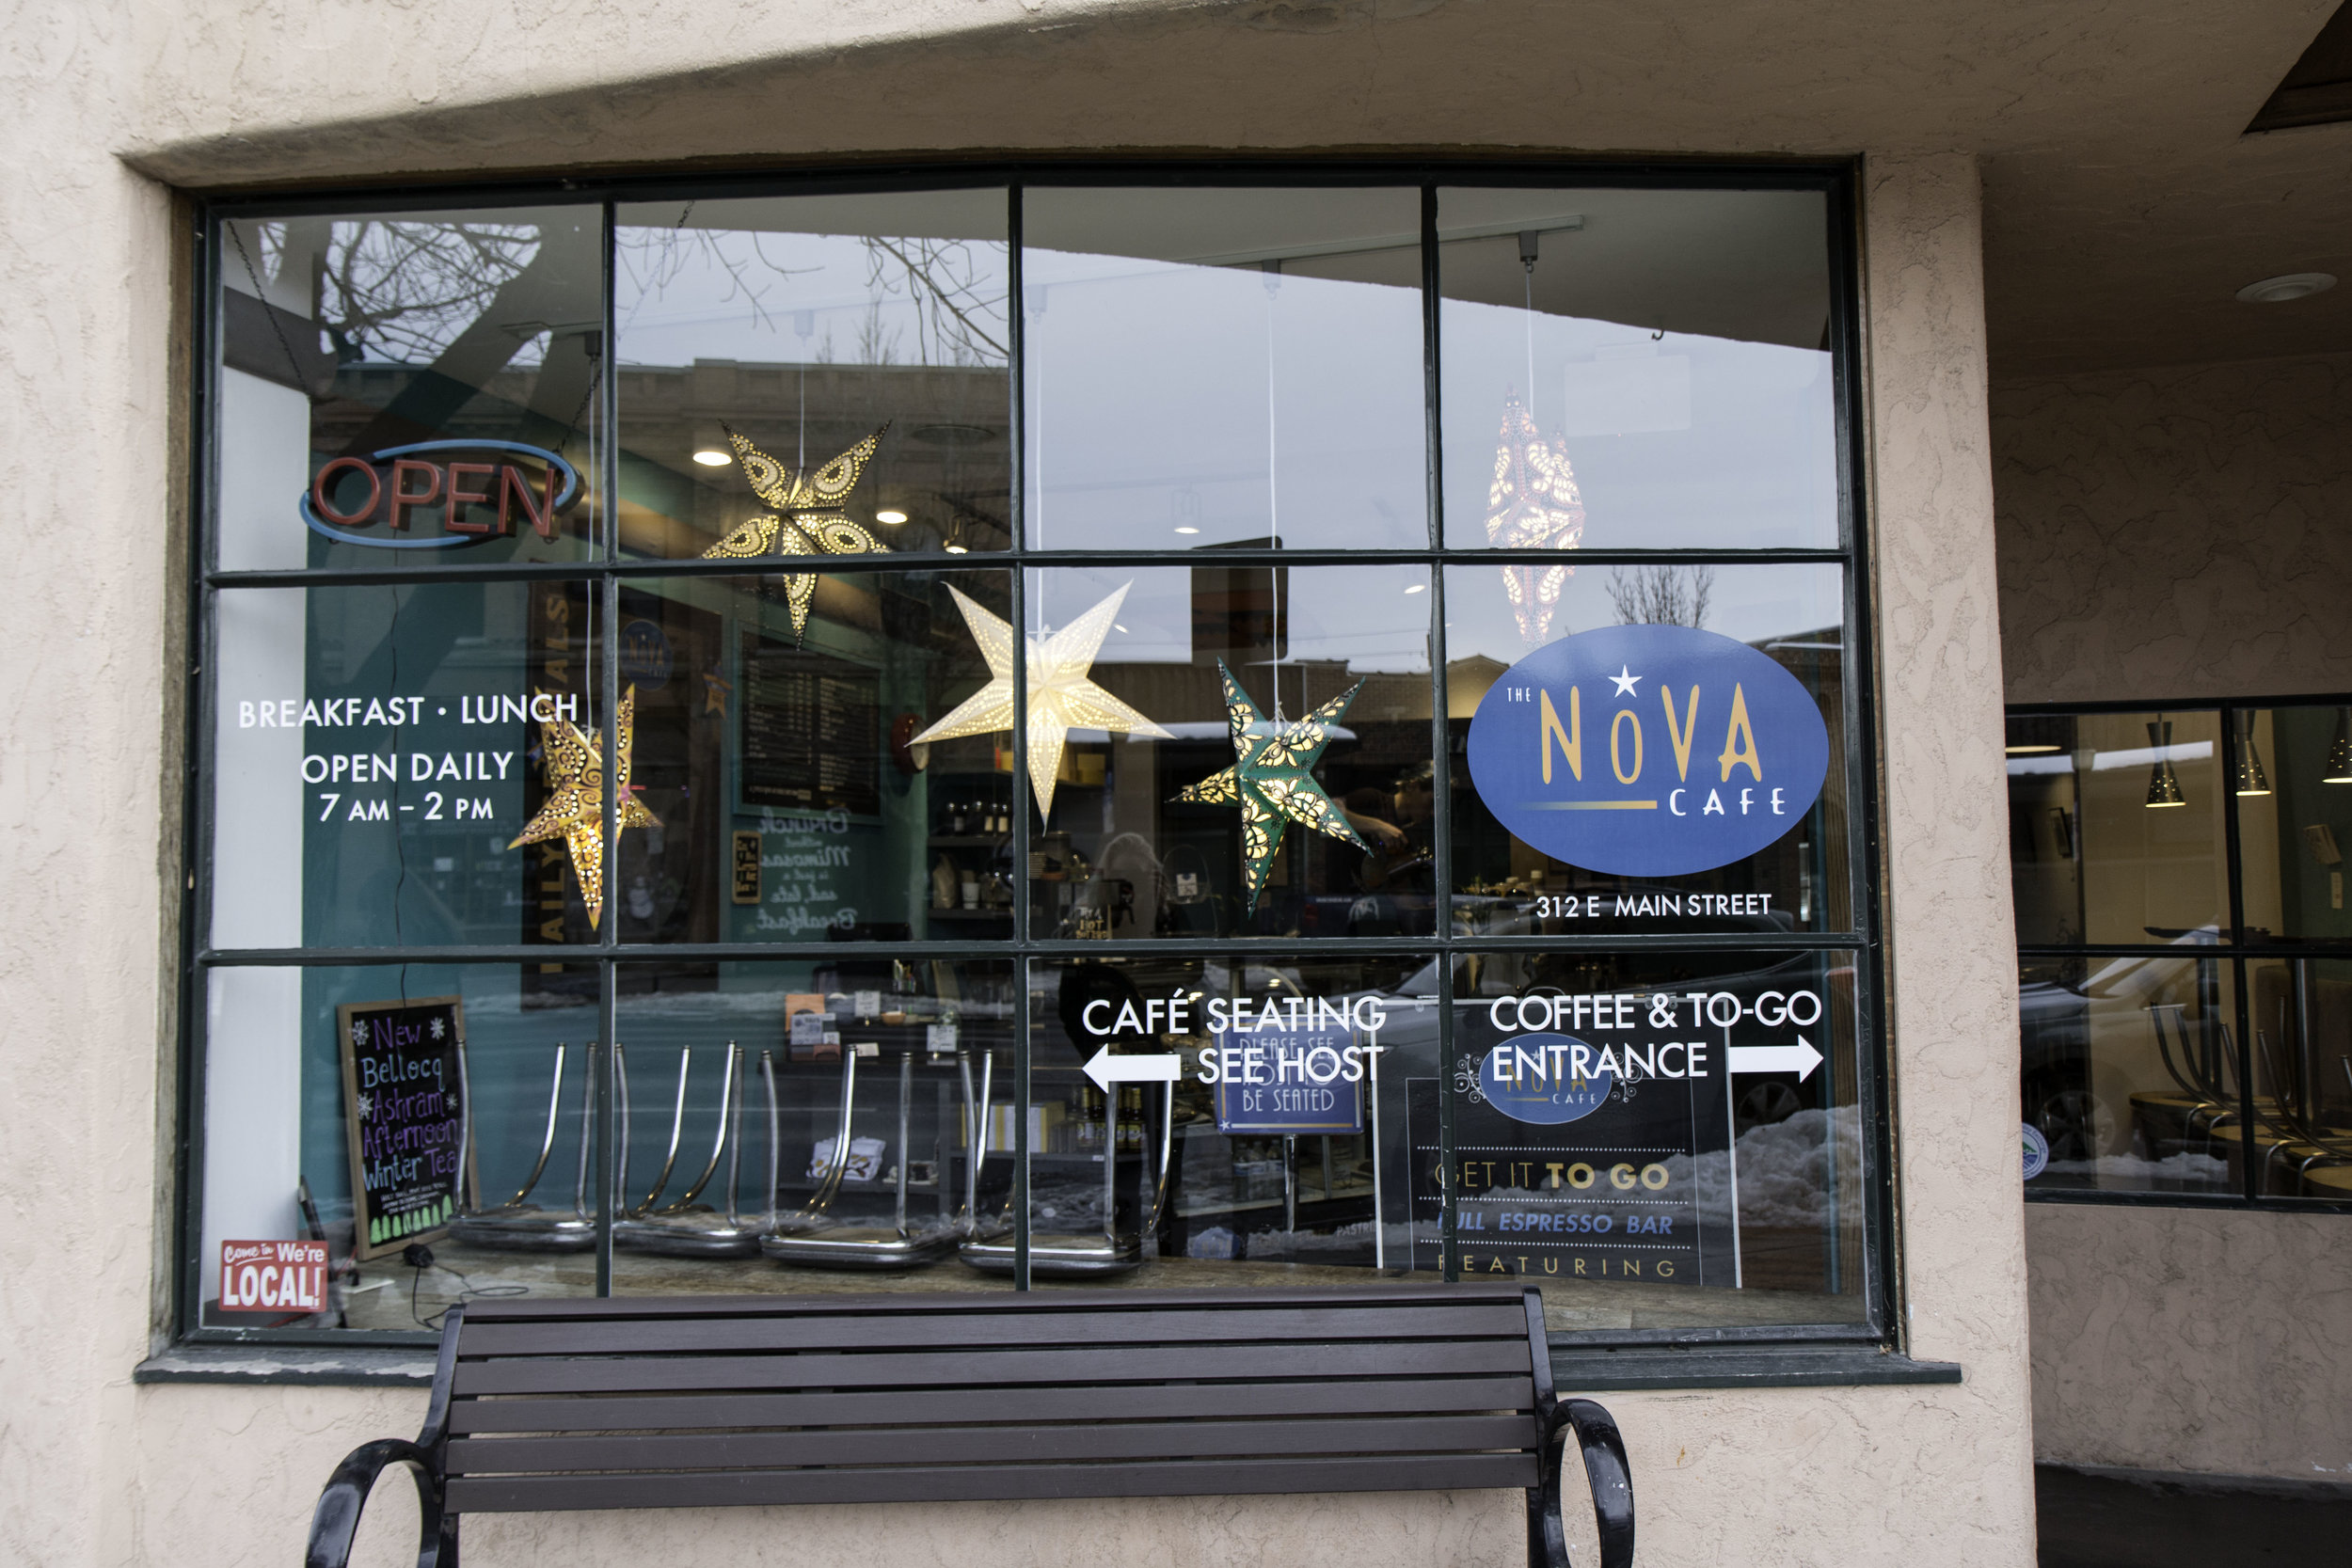 Nova Cafe in Downtown Bozeman, Montana